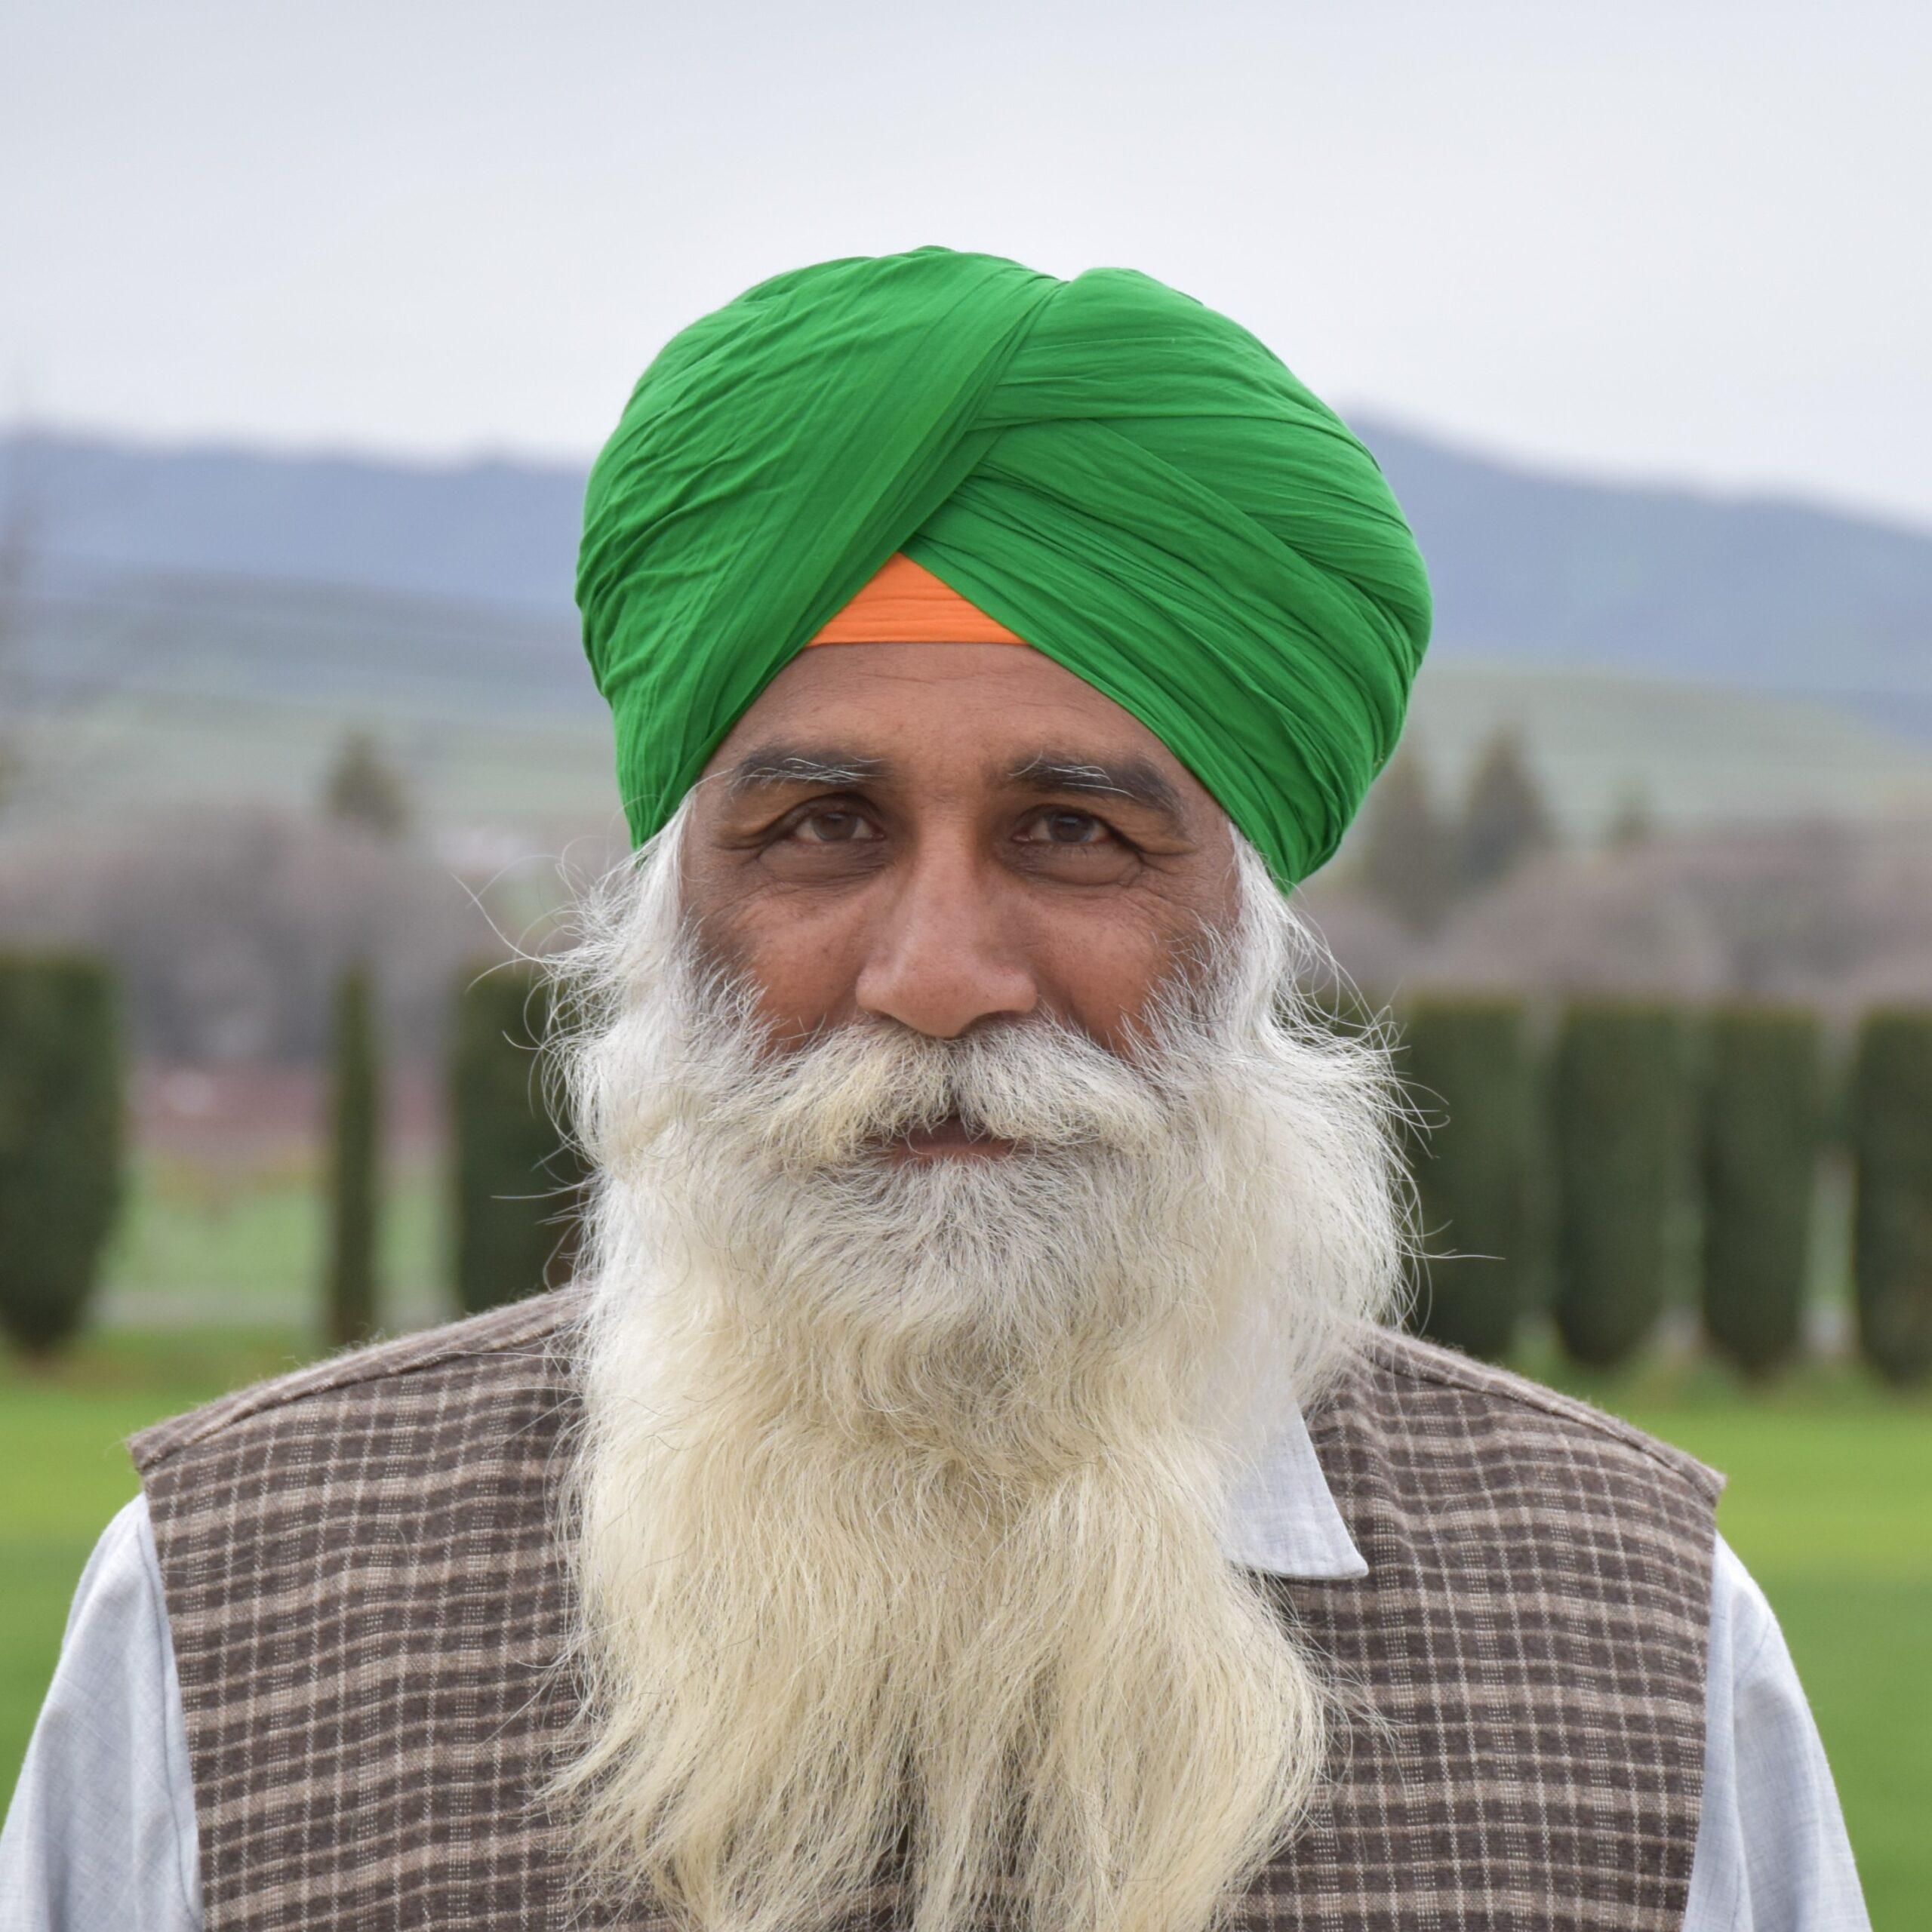 Harwinder Singh Deol